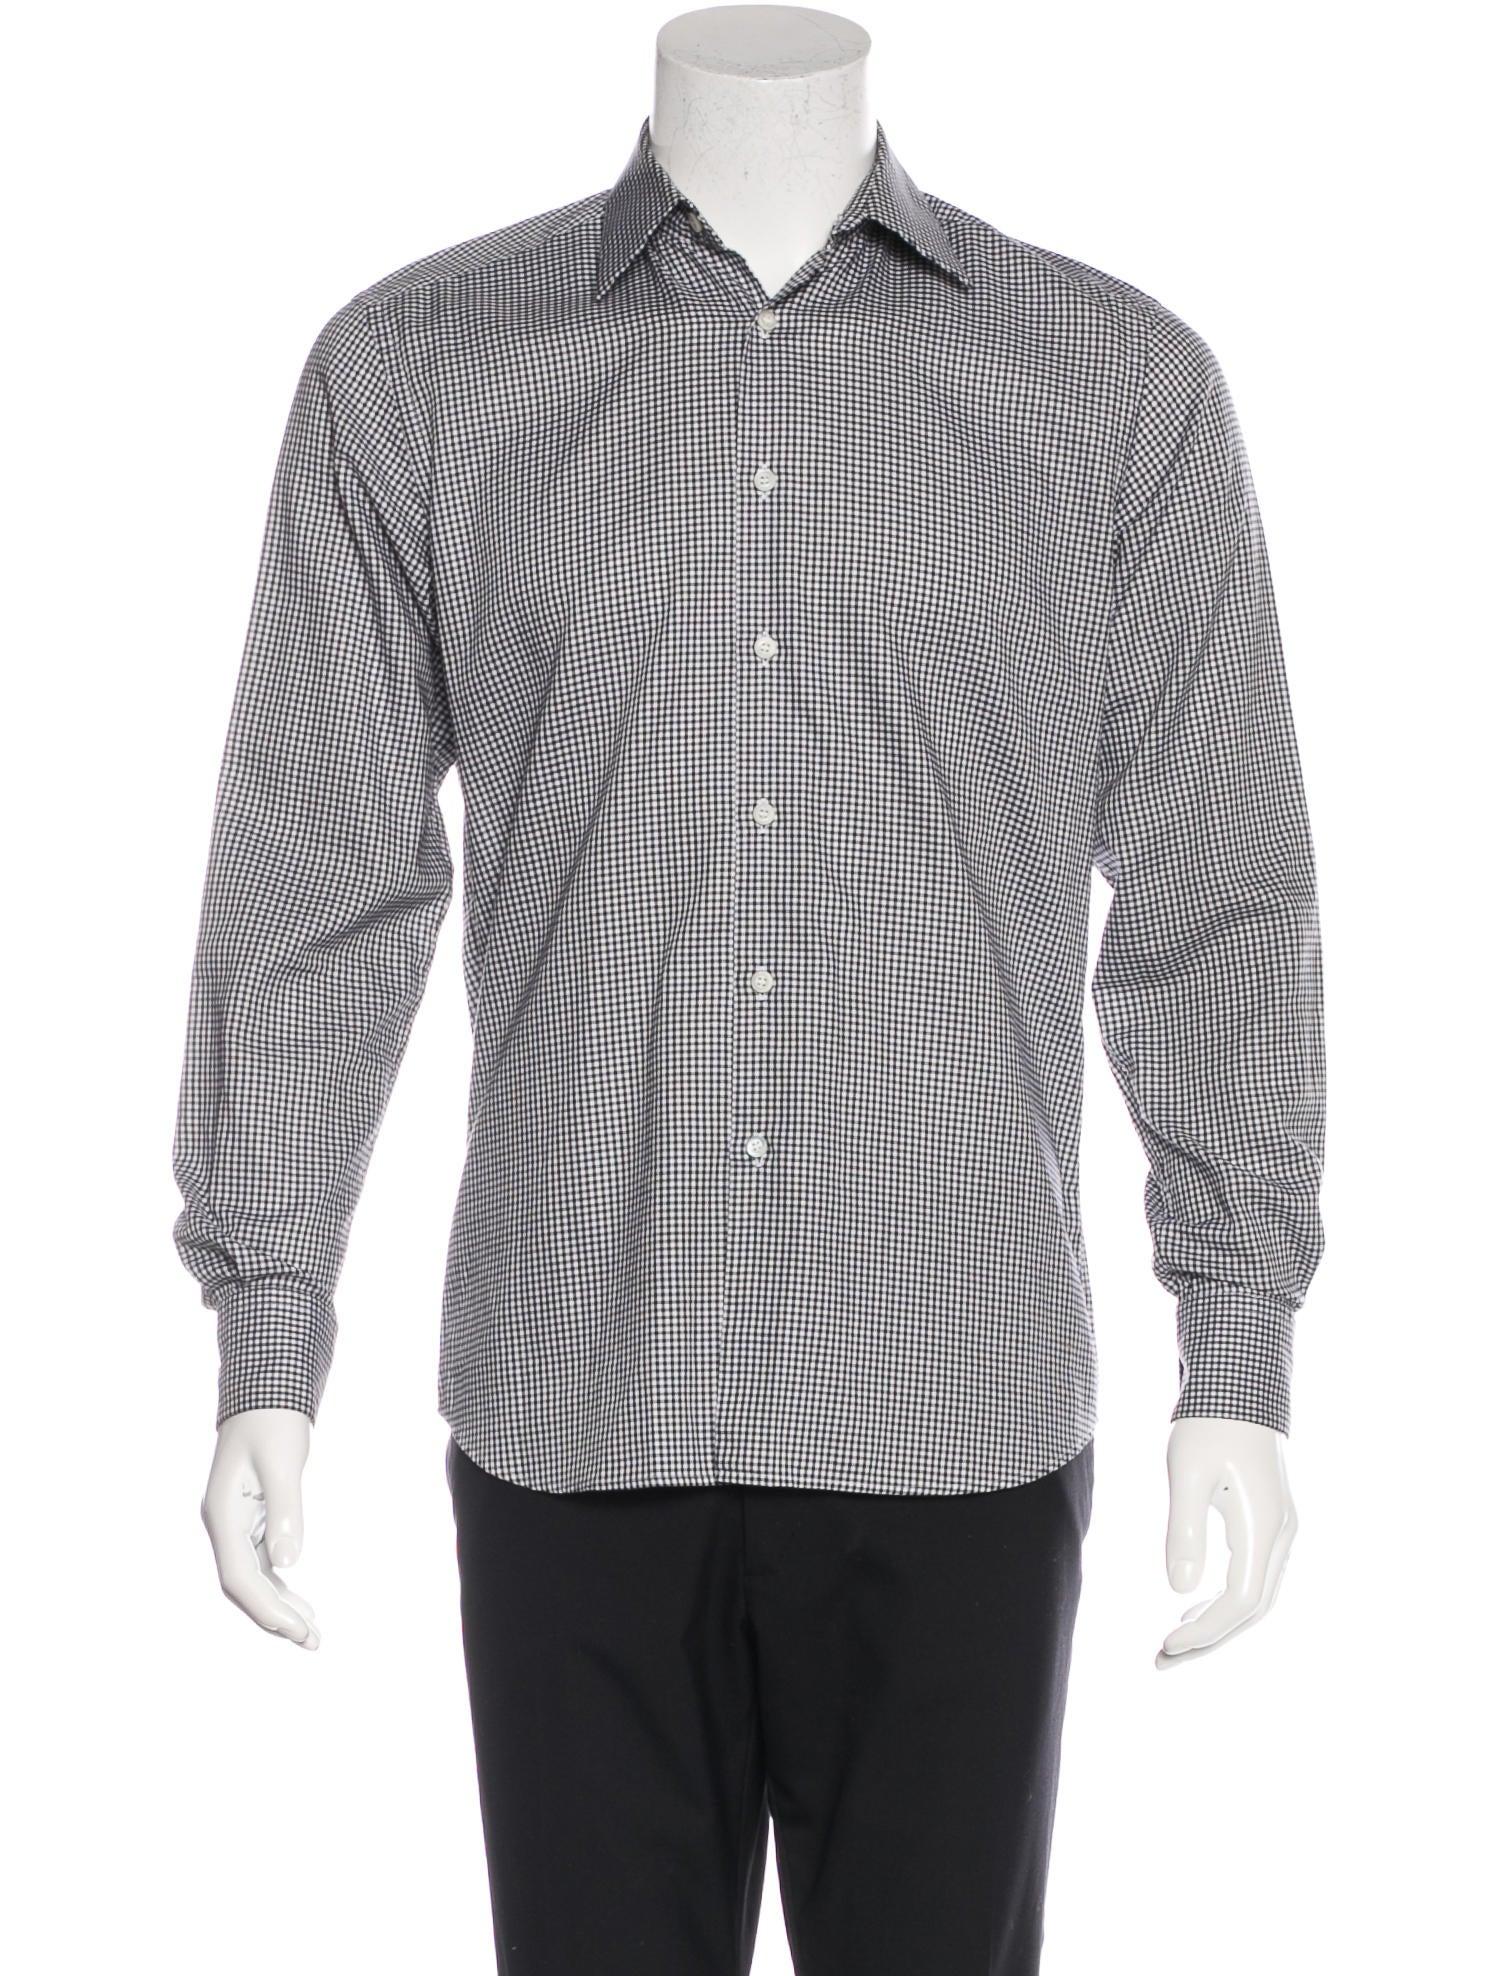 Prada gingham dress shirt clothing pra133592 the for Men s red gingham dress shirt